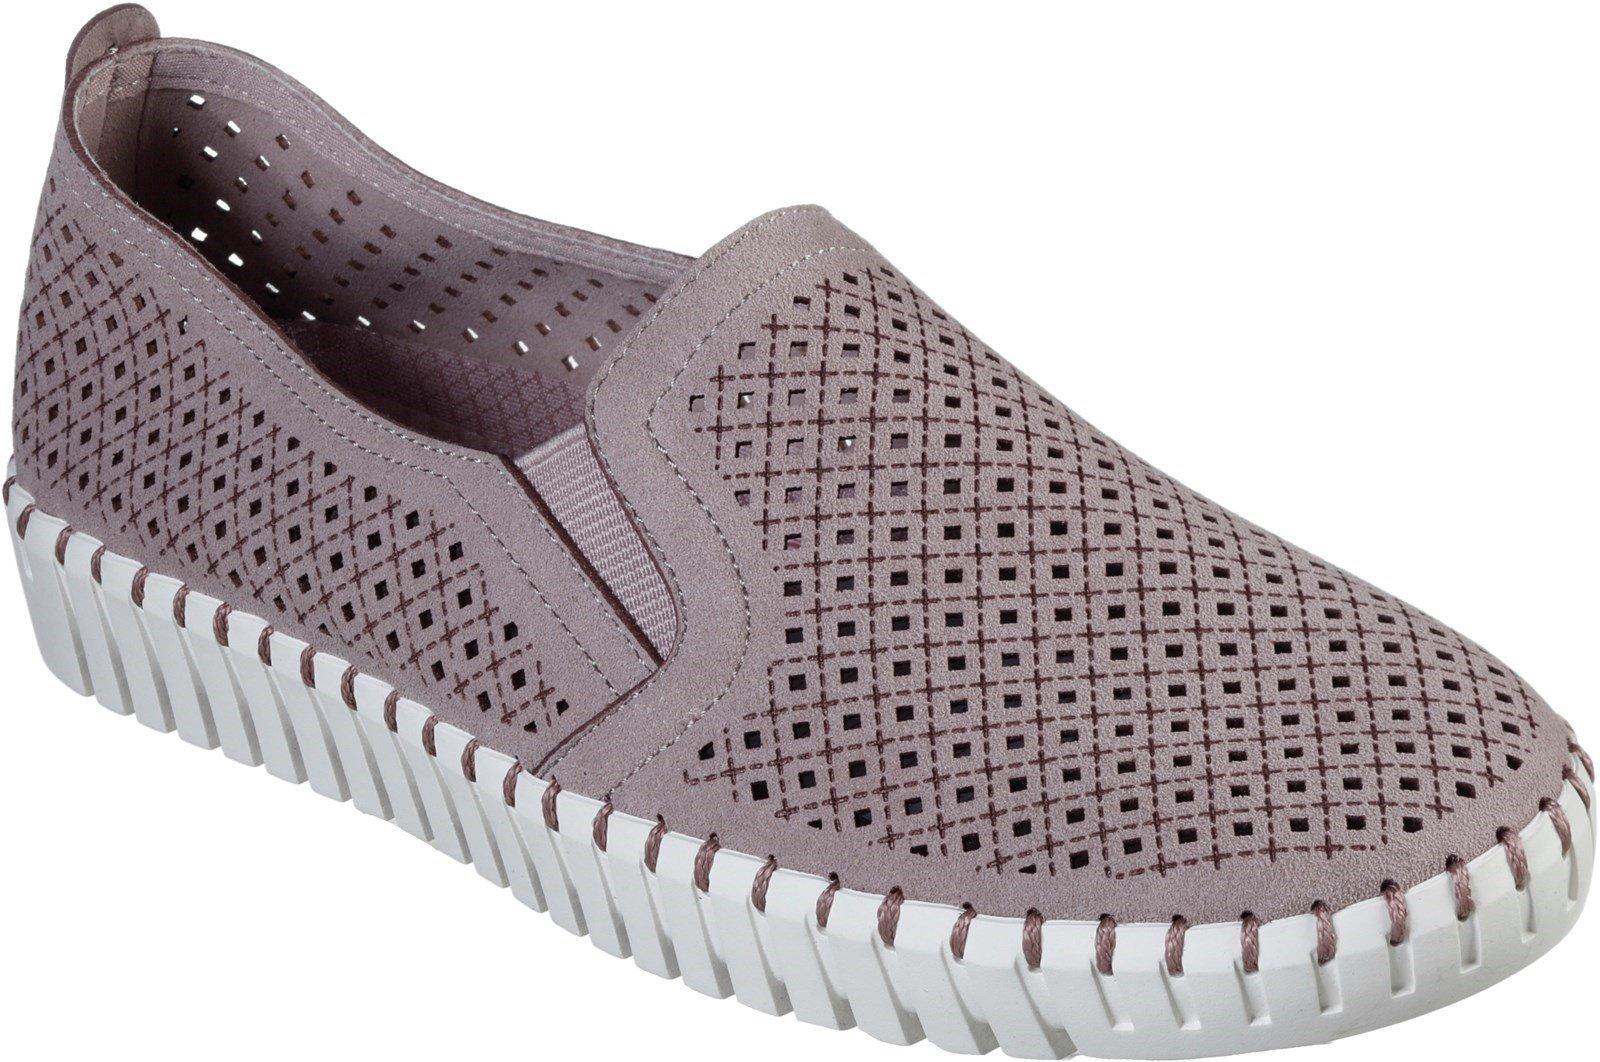 Skechers Women's Sepulveda Blvd Slip On Loafer Various Colours 30324 - Lilac 3